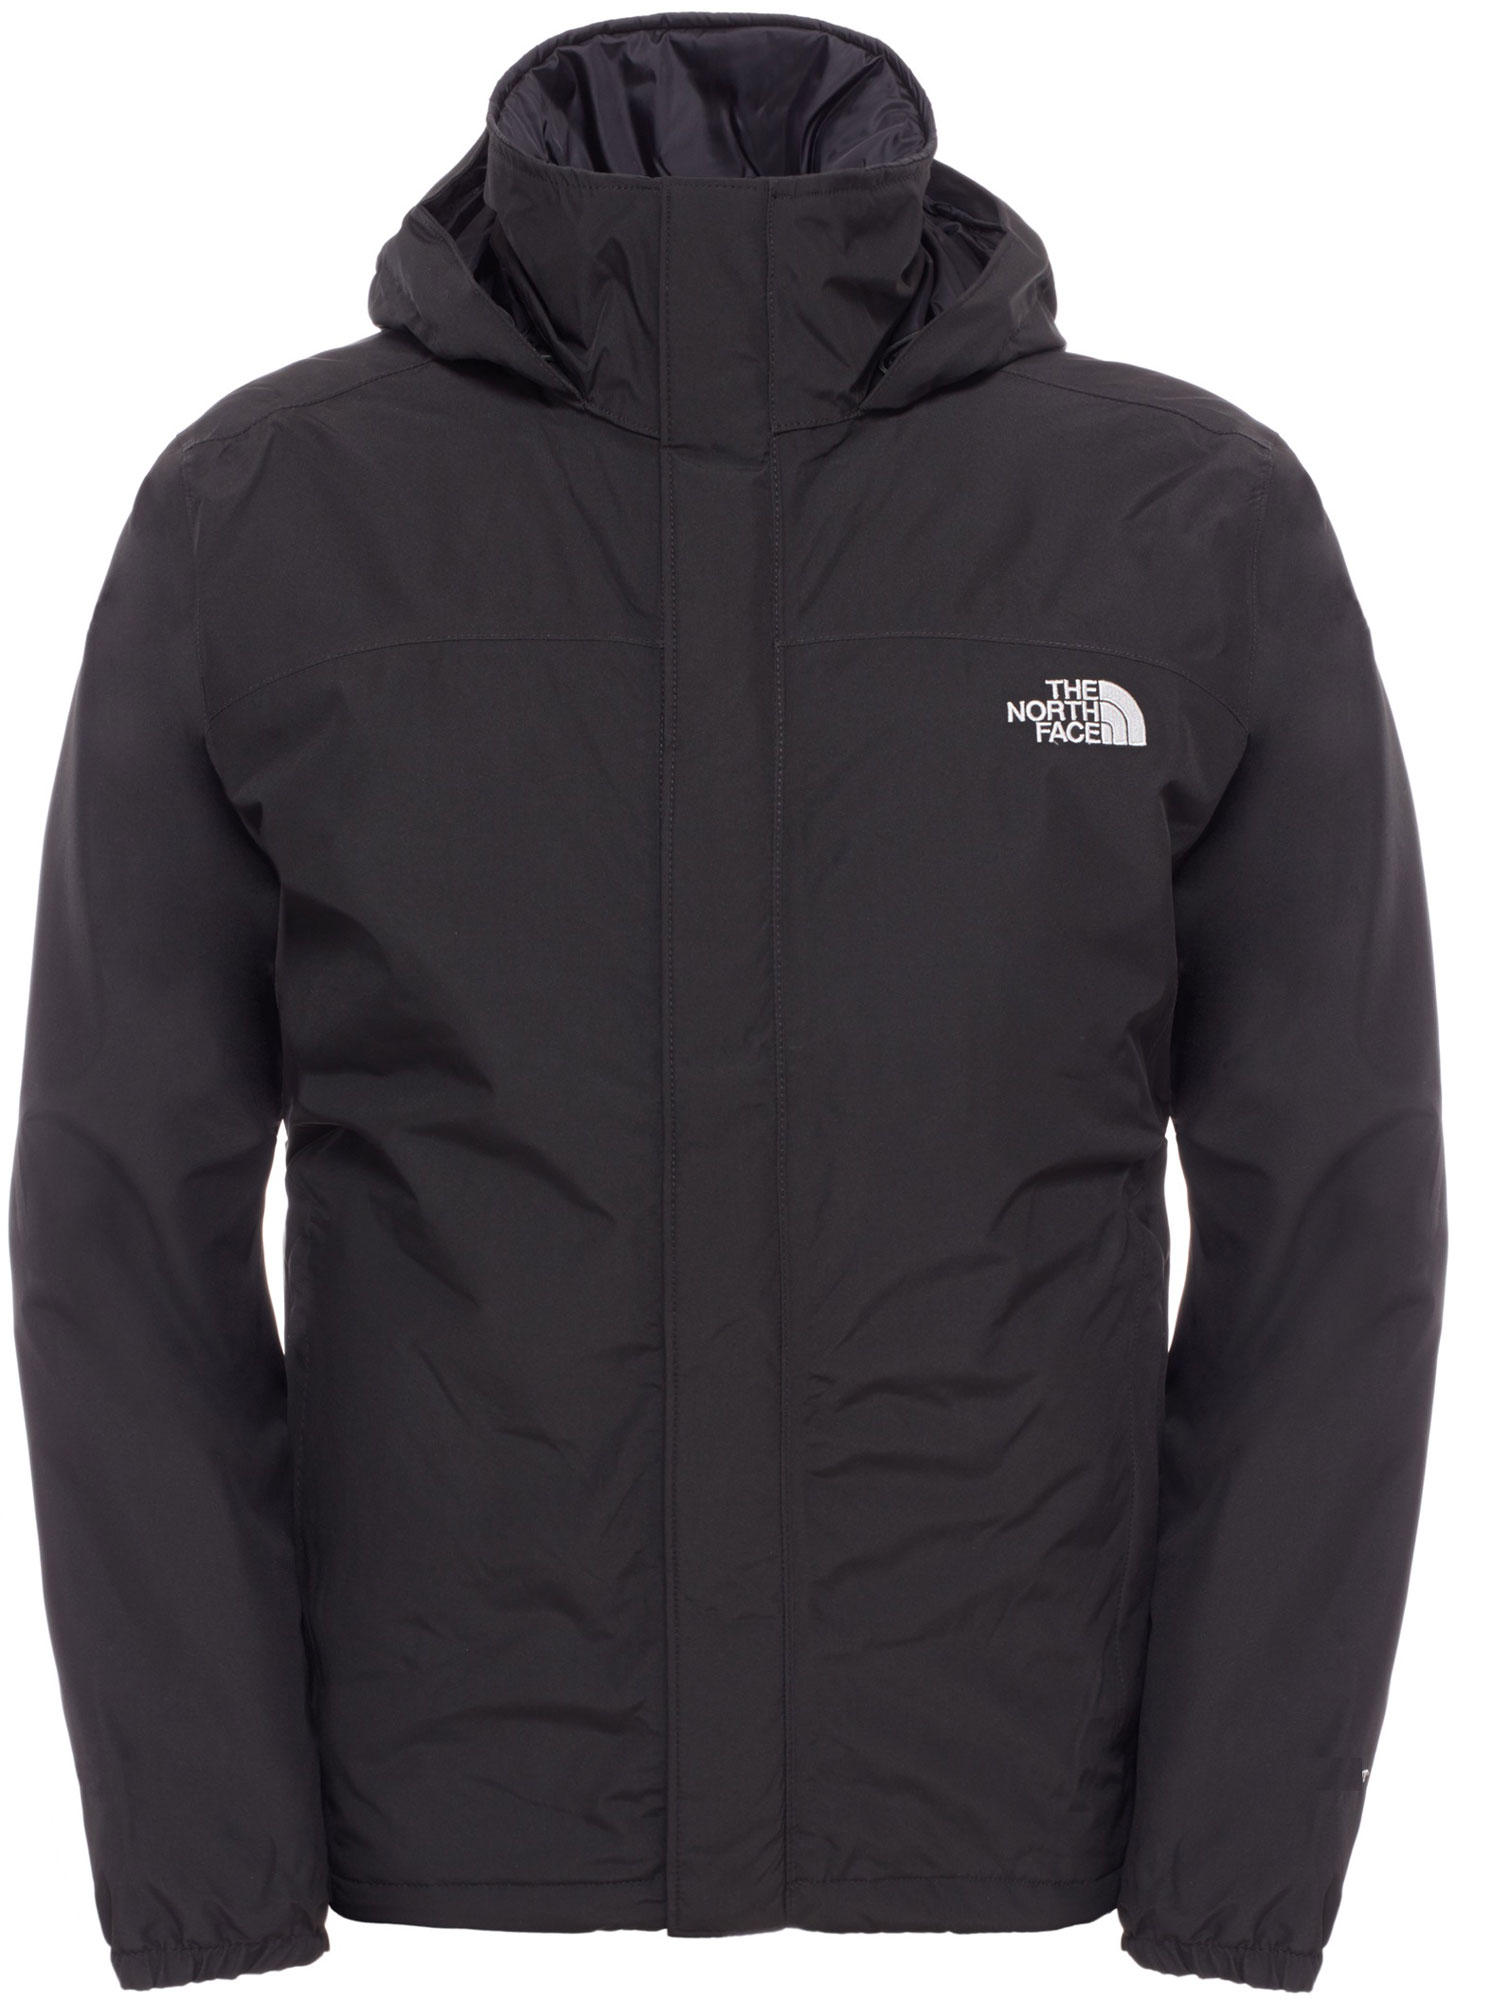 The North Face RESOLVE INSULATED JACKET M. Pánska zimná bunda 296001bf2b0